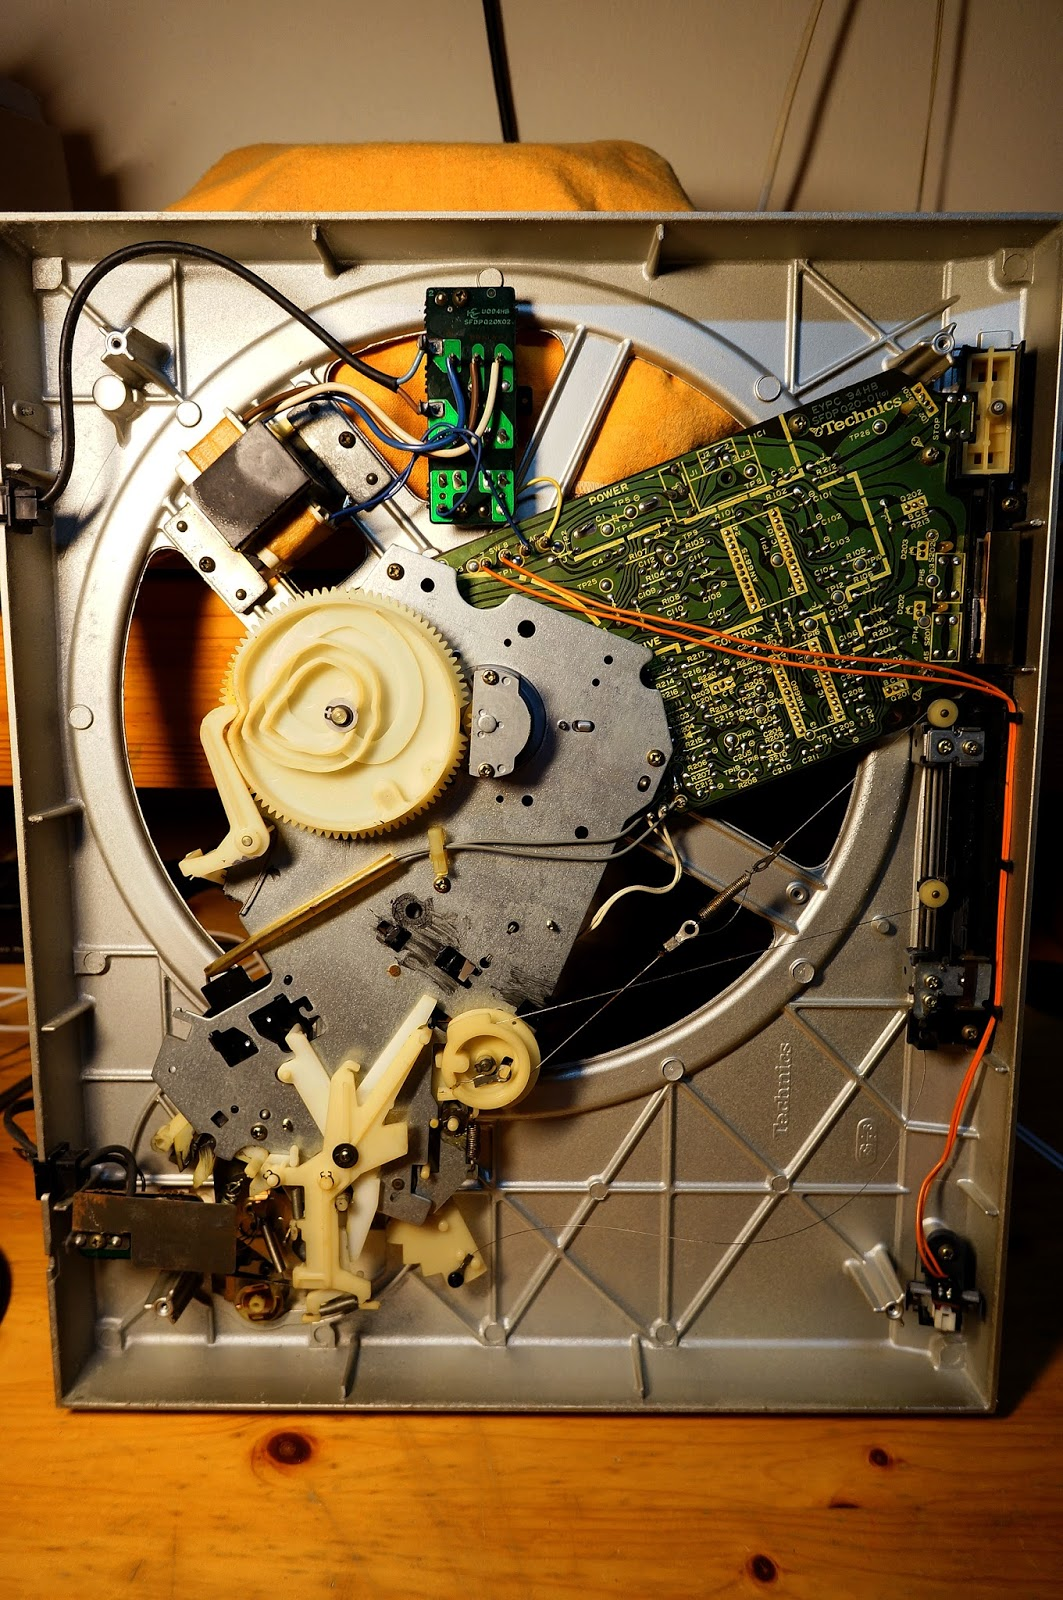 technics sl 1600 wiring diagram auto electrical wiring diagram u2022 rh 6weeks co uk